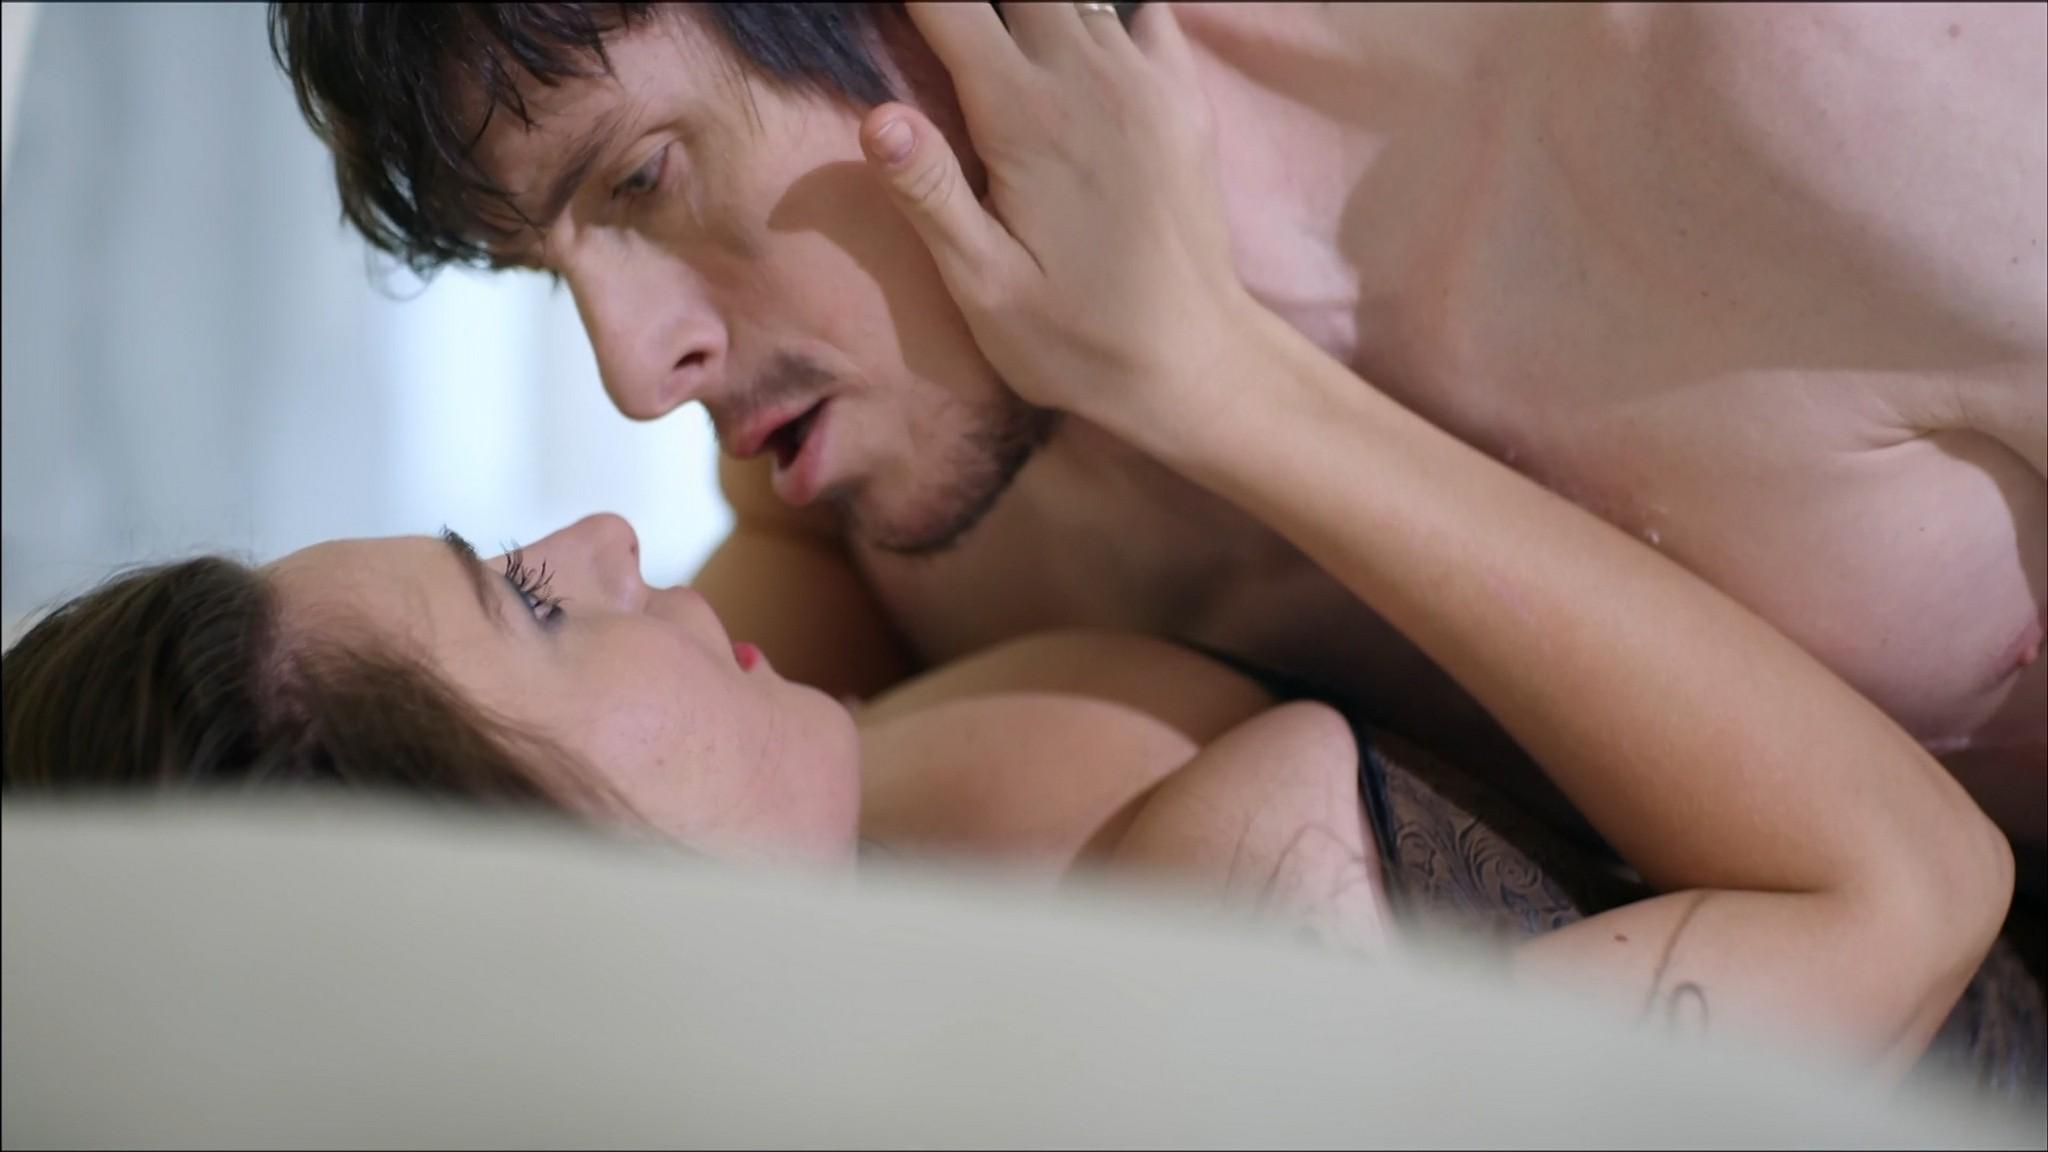 Mindy Robinson see through Christina Collard nude Dracula The Impaler 2013 1080p BluRay 9